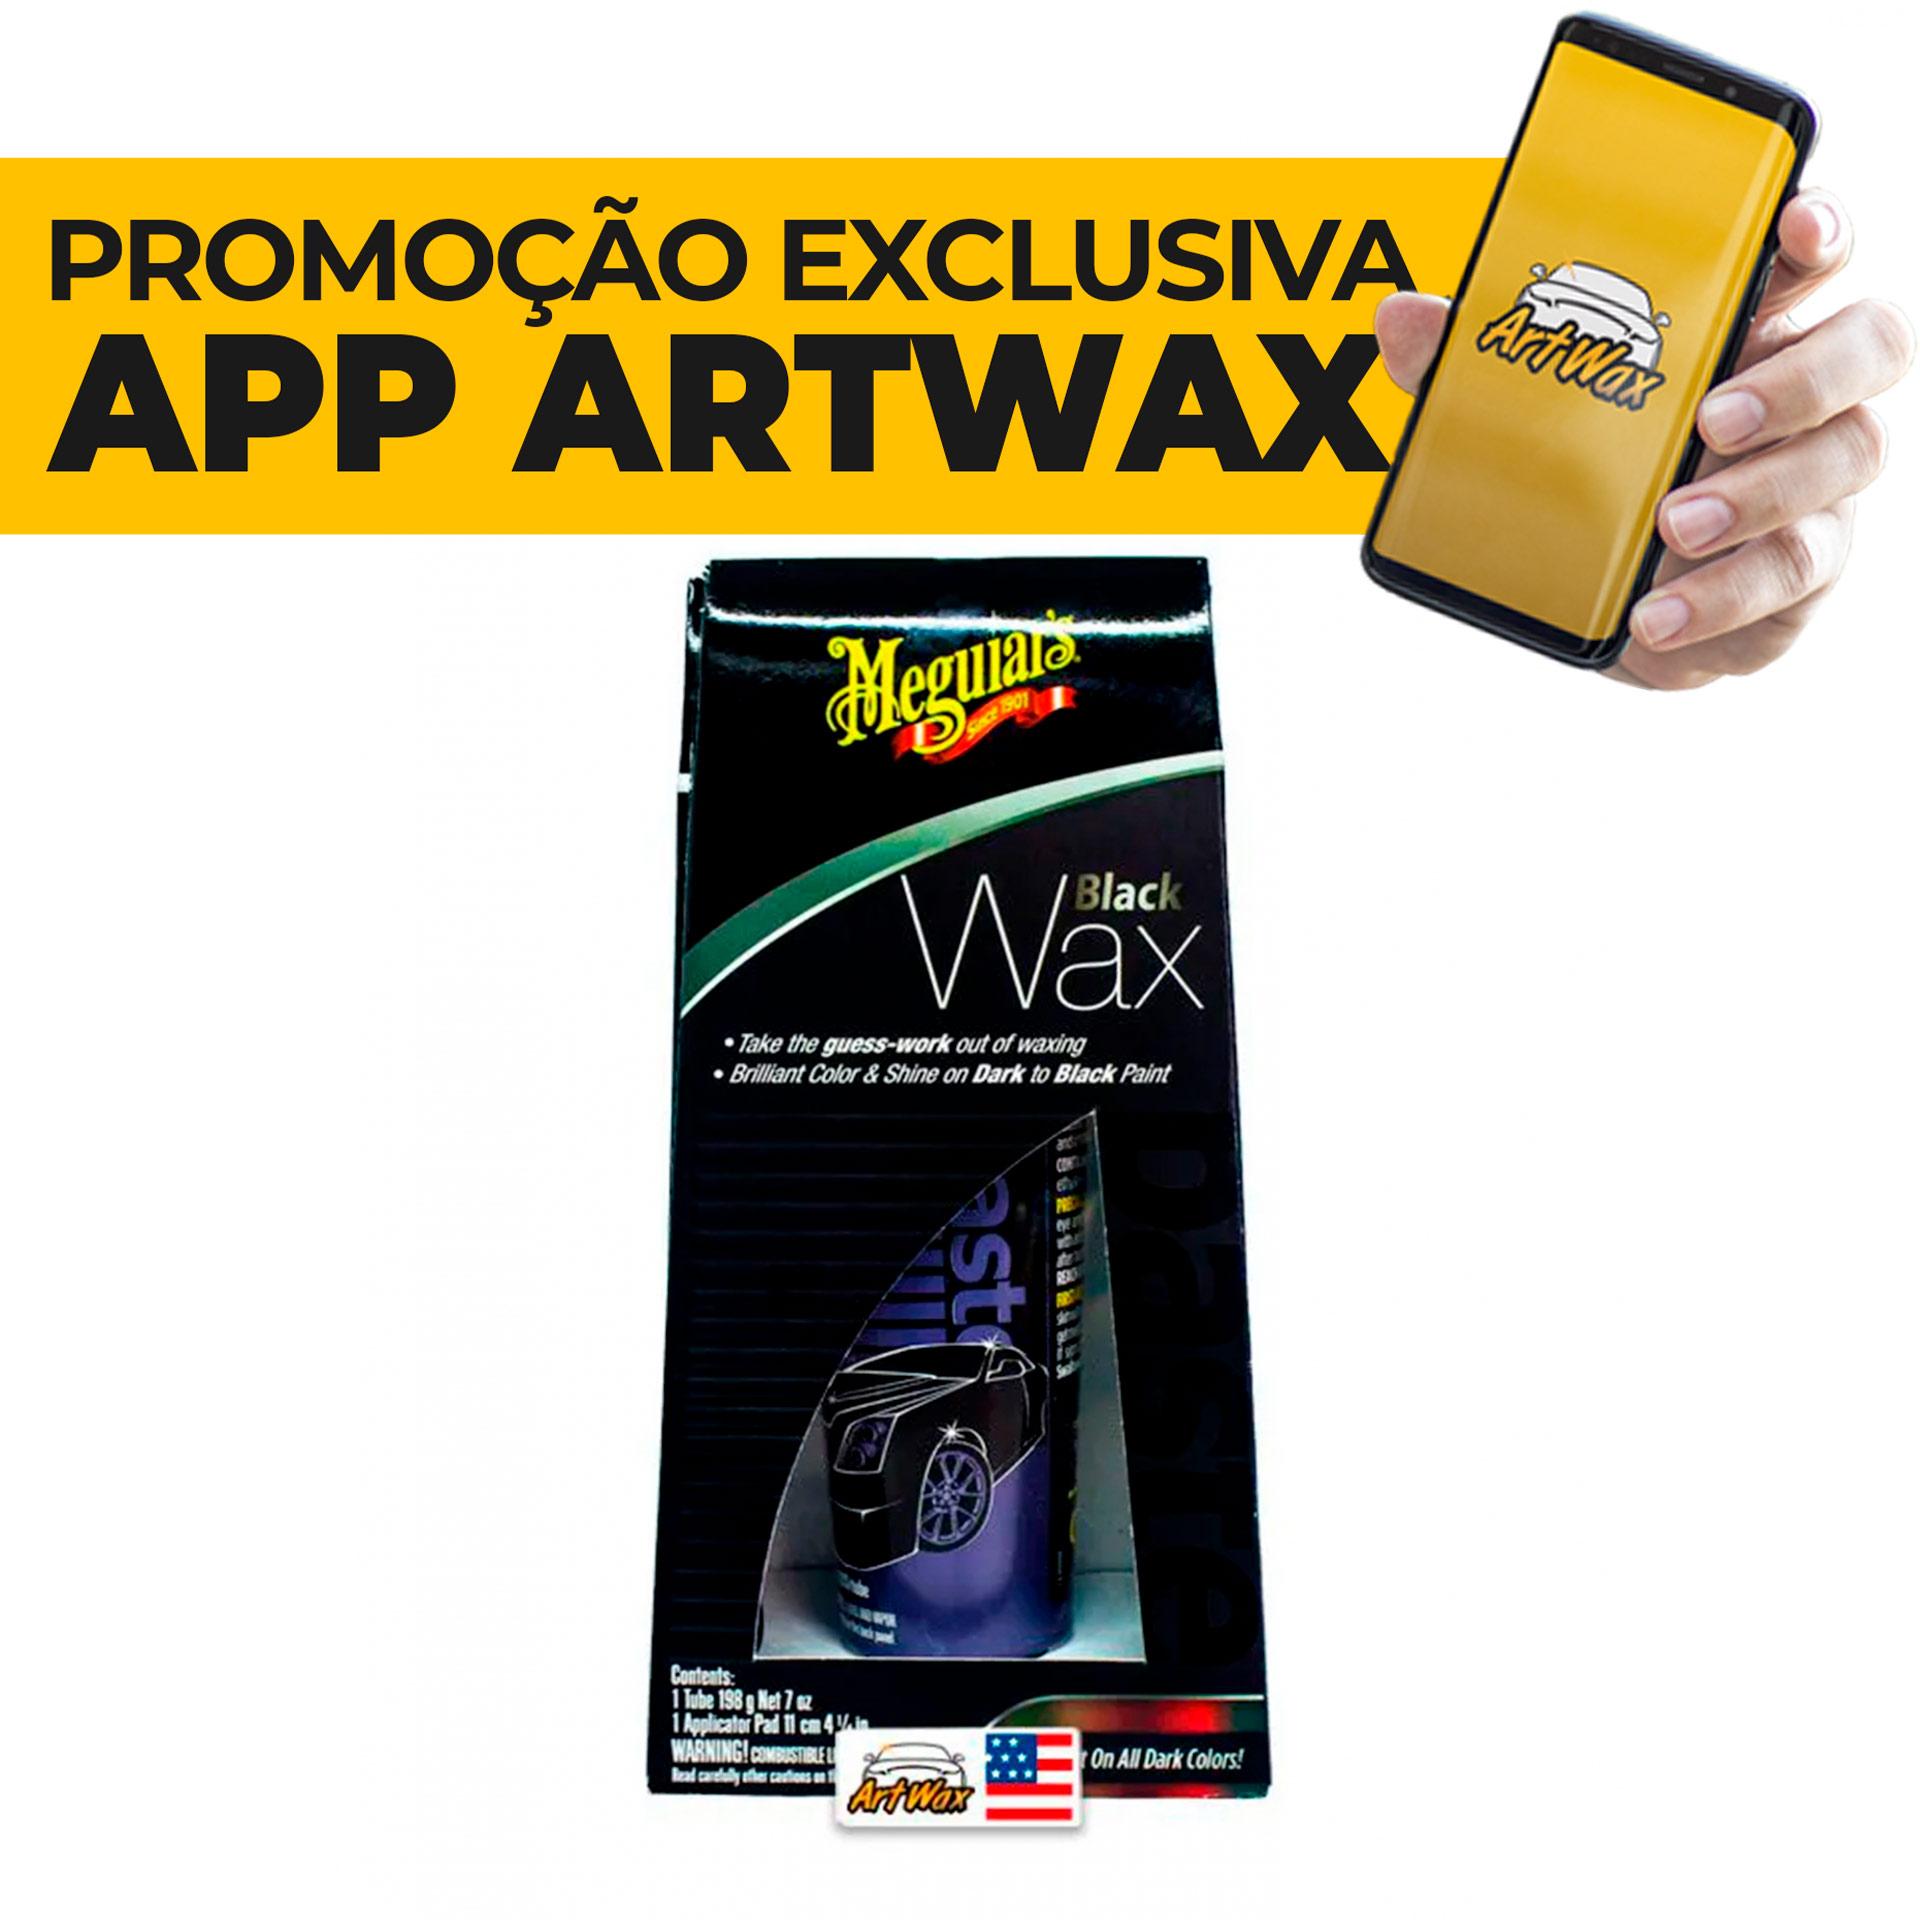 Meguiars Black Wax 198g - Cera Para Cores Escuras